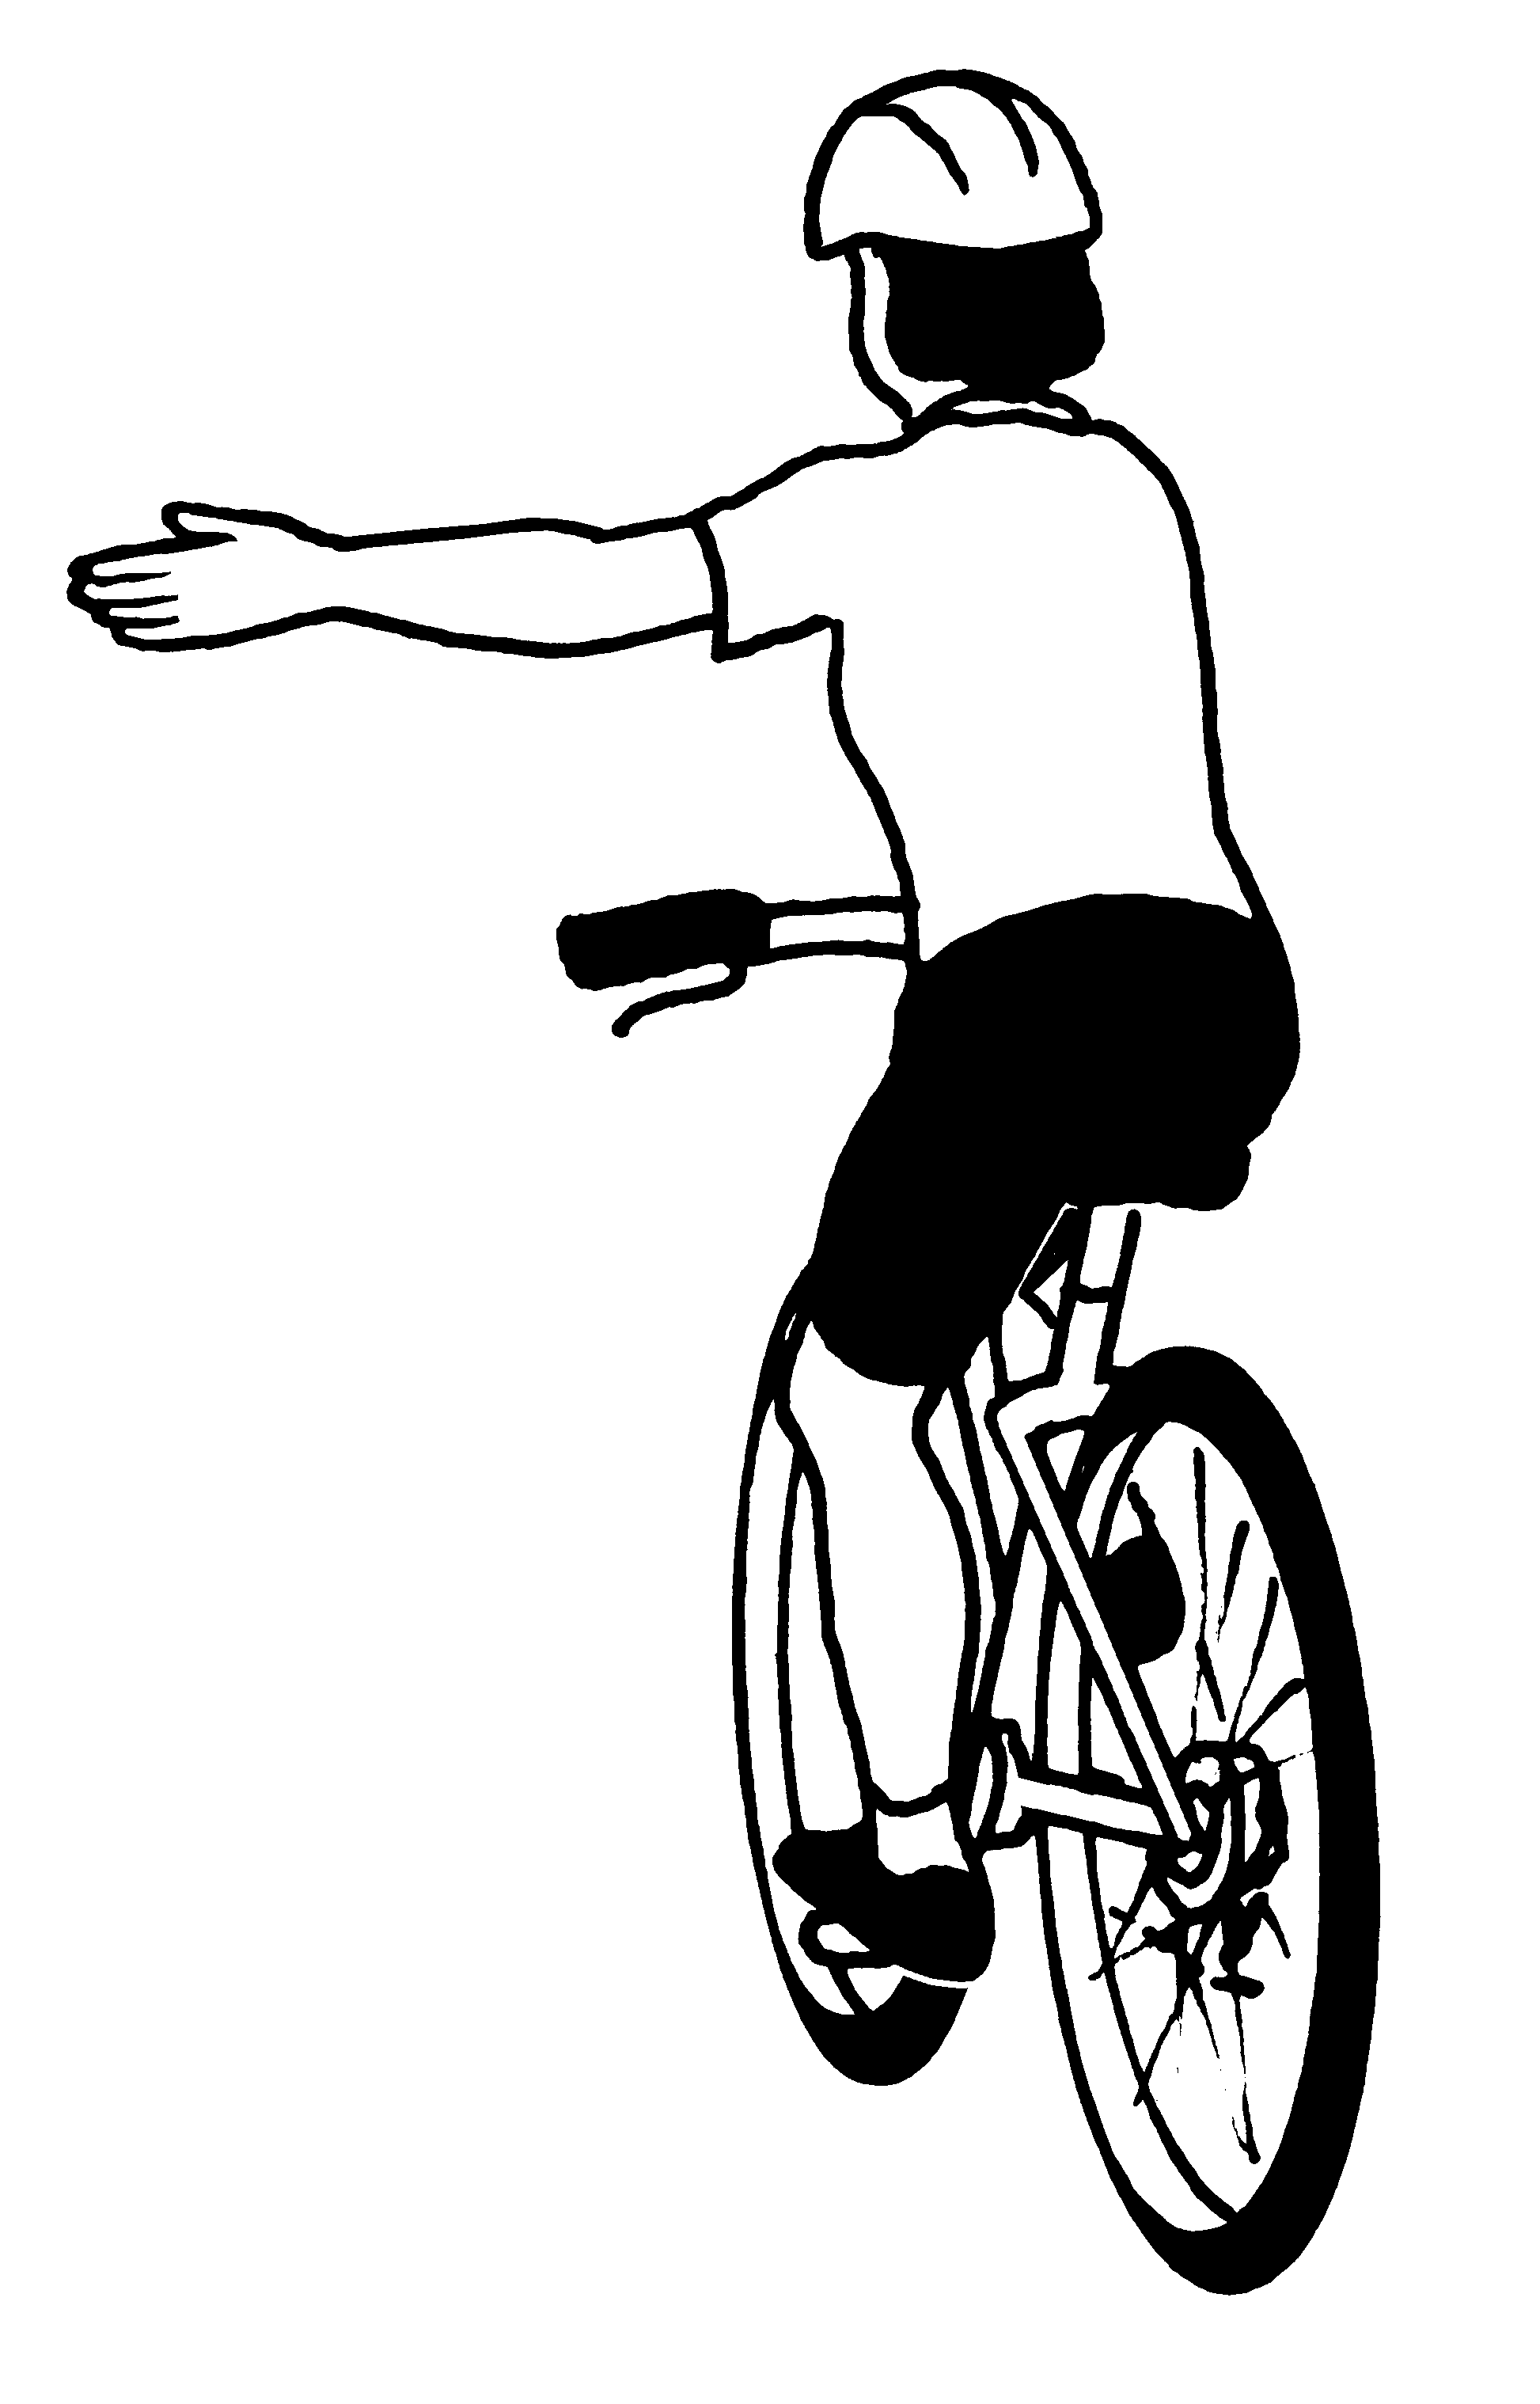 Bike clipart bike safety. Linc students learn rules